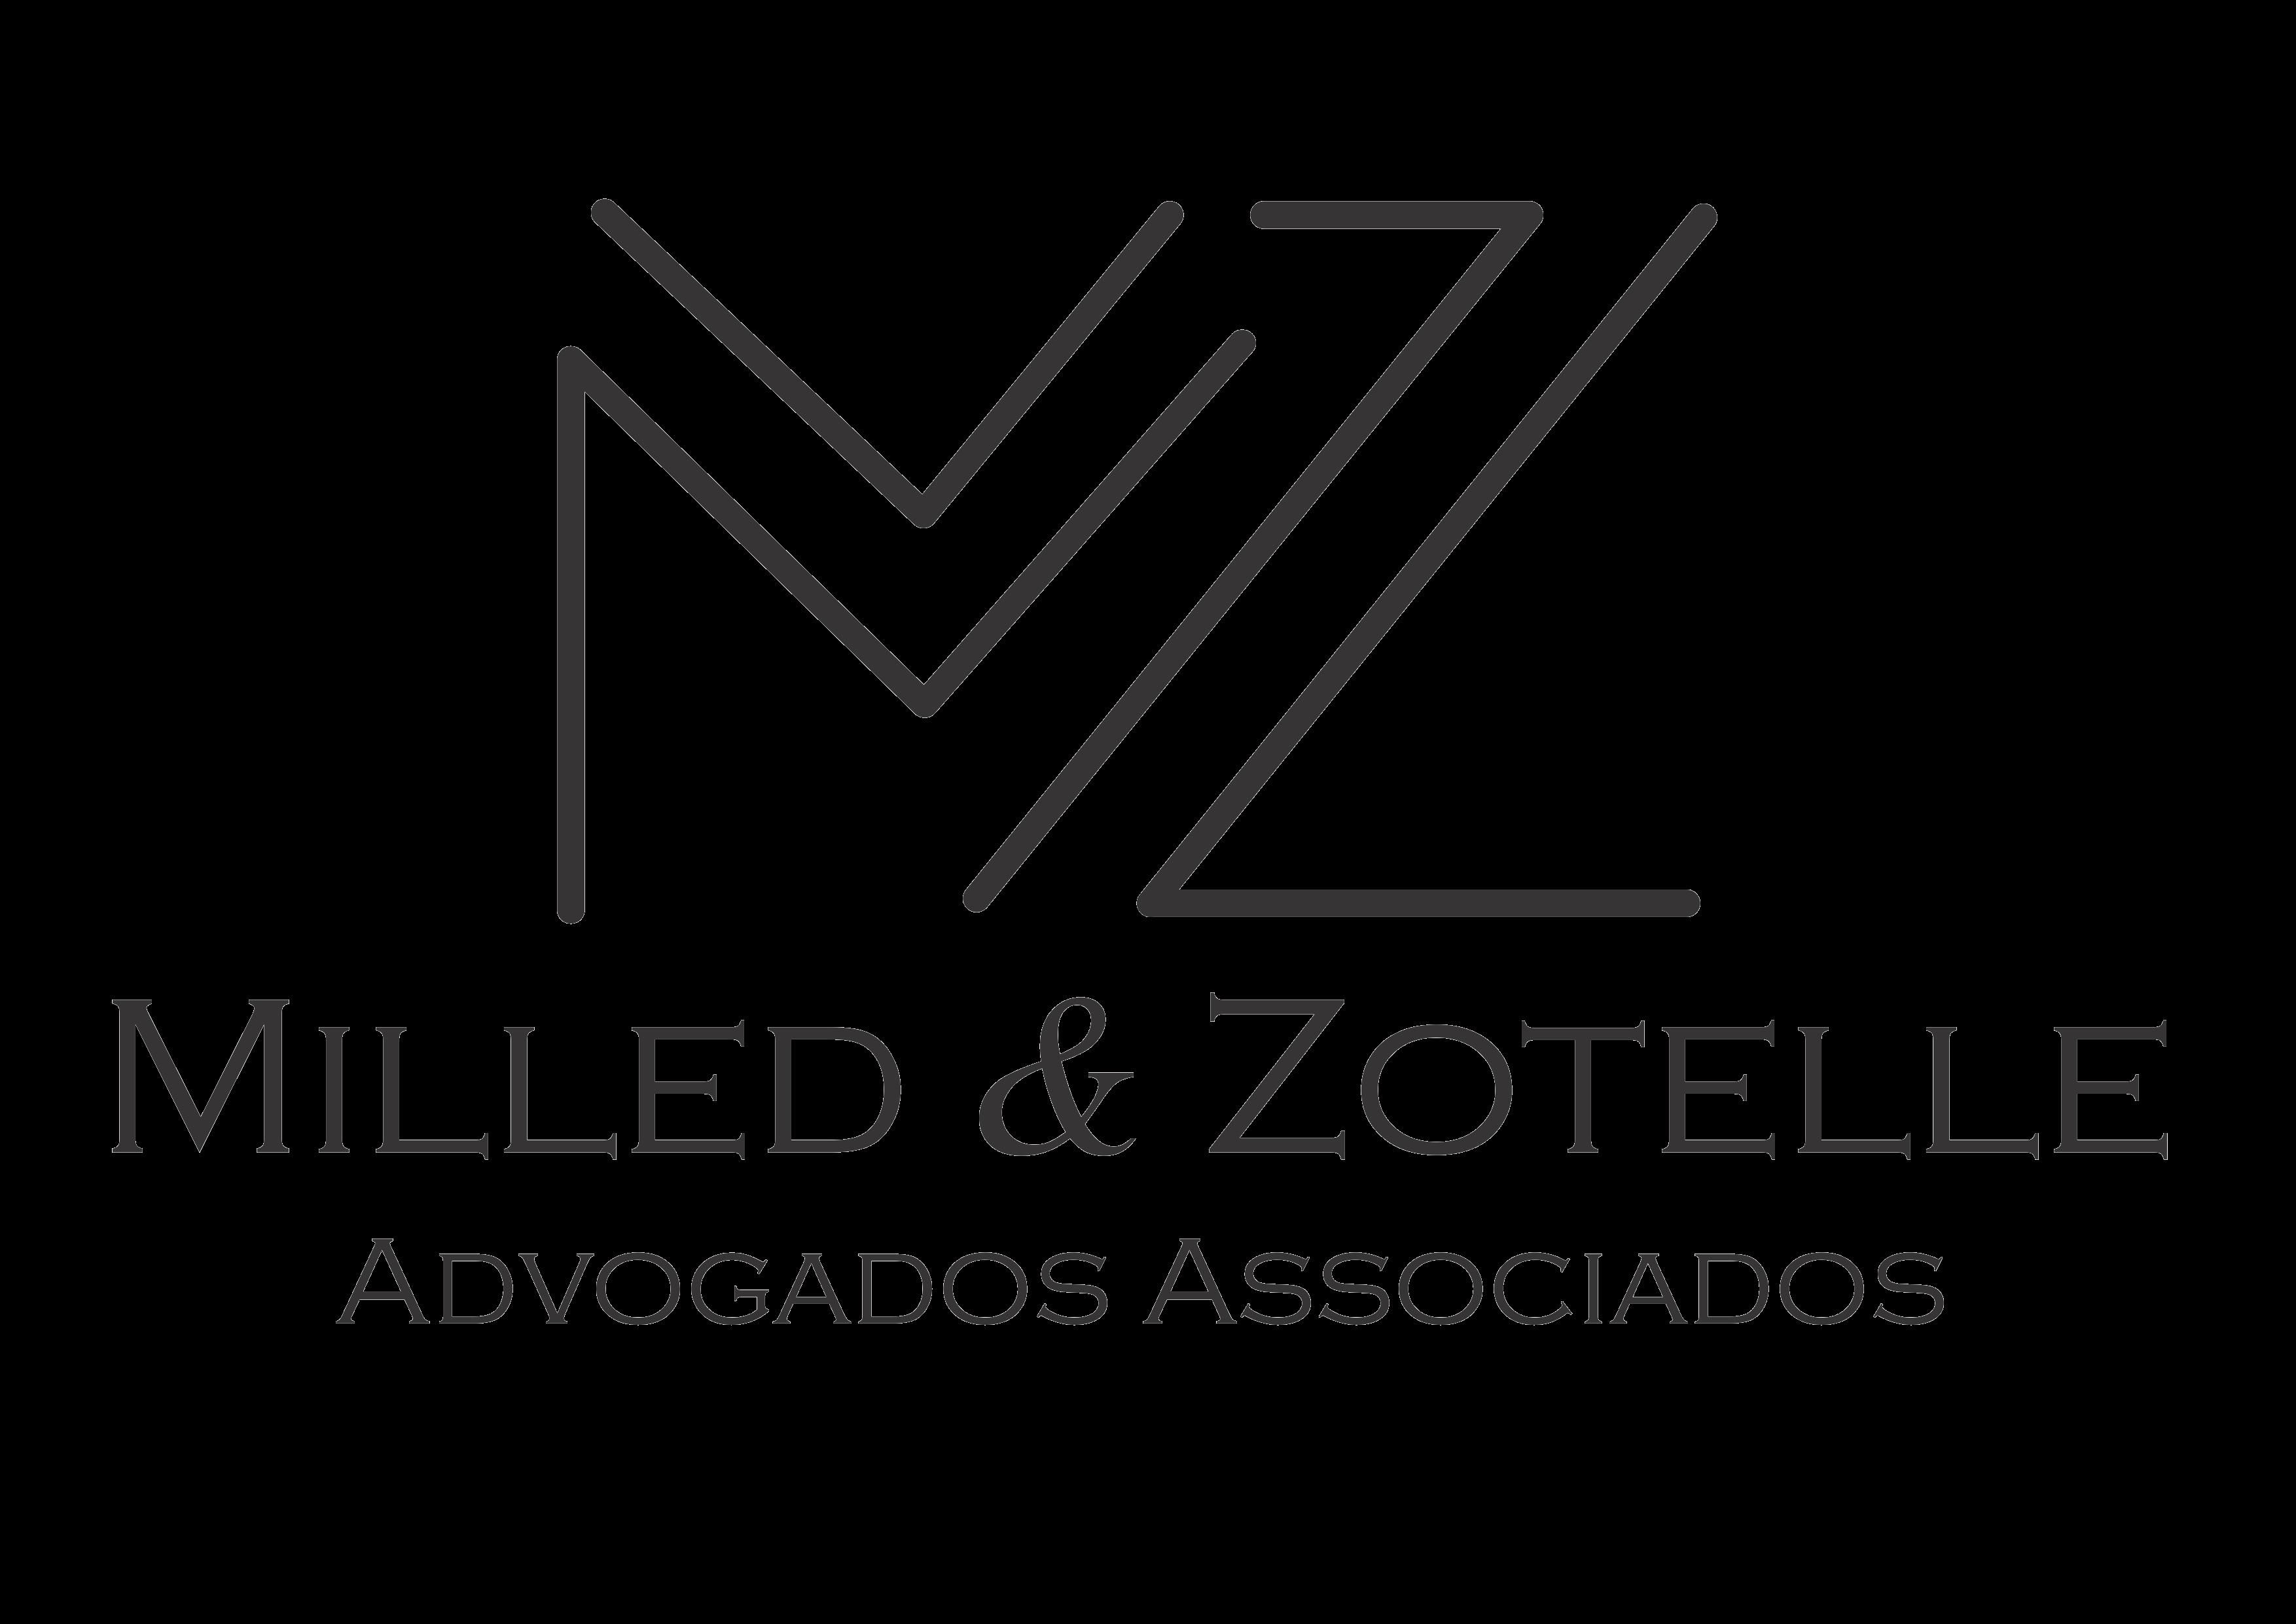 Milled&Zotelle_Advogados_Associados_ logo PNG